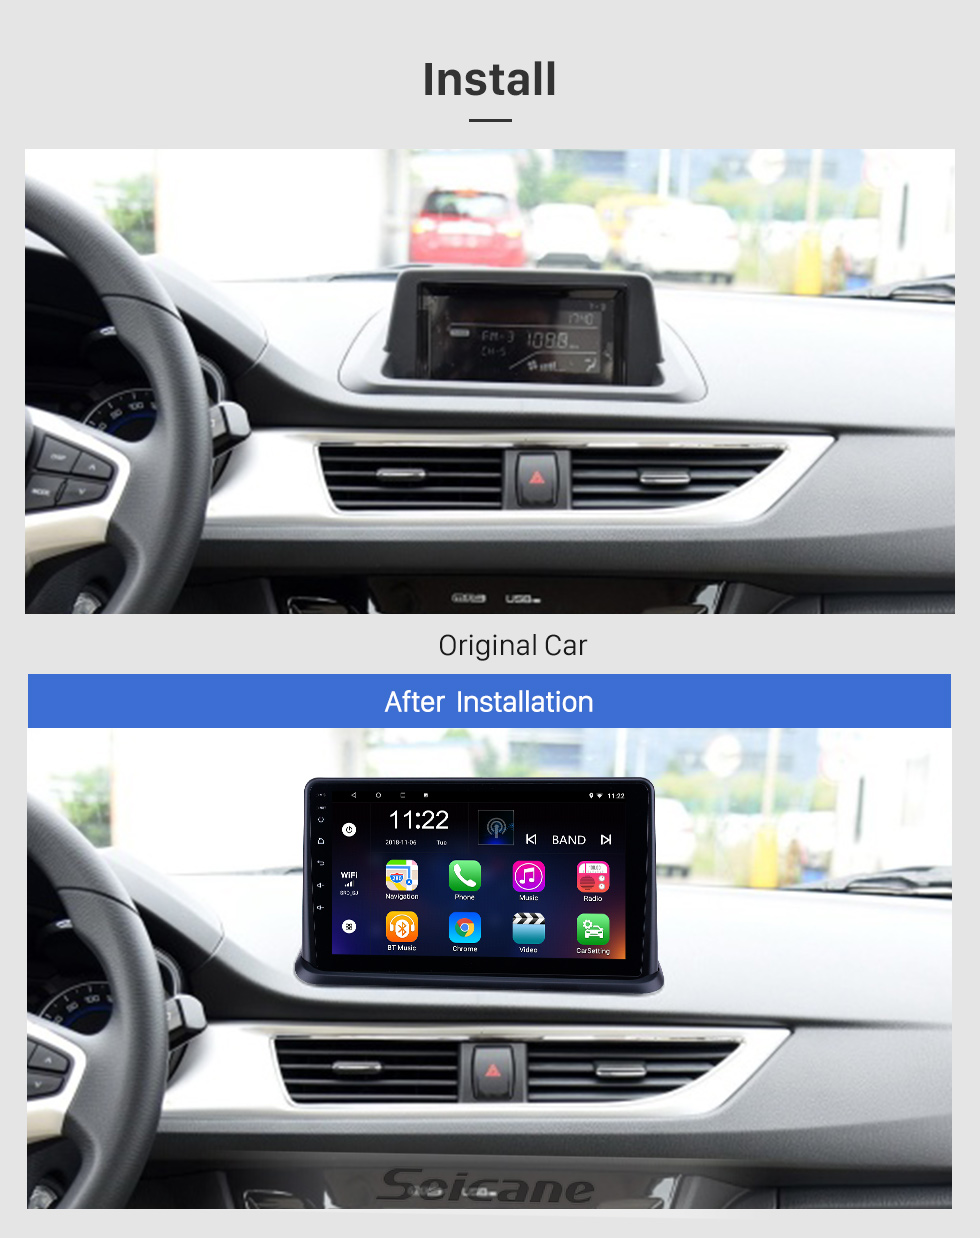 Seicane OEM 9 Zoll Android 8.1 Radio für 2015 Changan Alsvin V7 Bluetooth HD Touchscreen GPS Navigation Unterstützung Carplay Rückfahrkamera